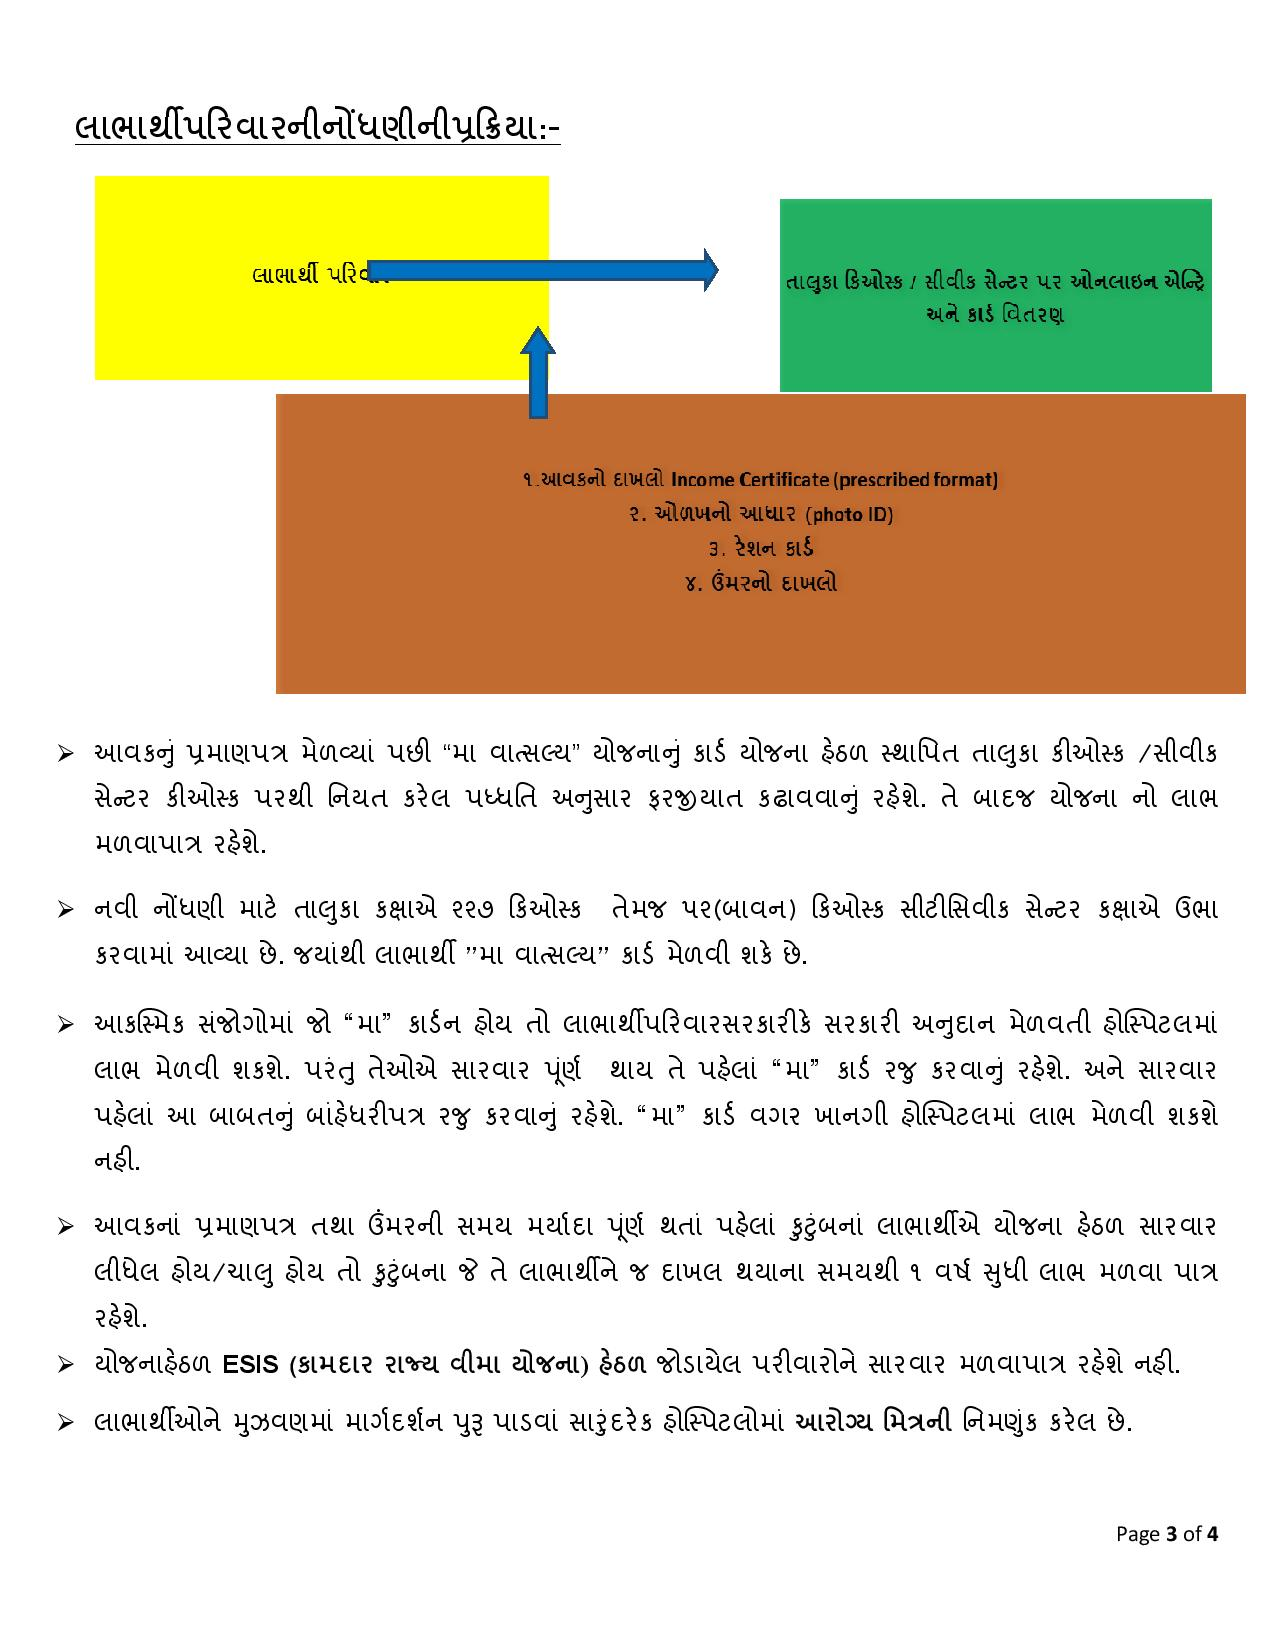 Image result for ma vatsalya yojana image